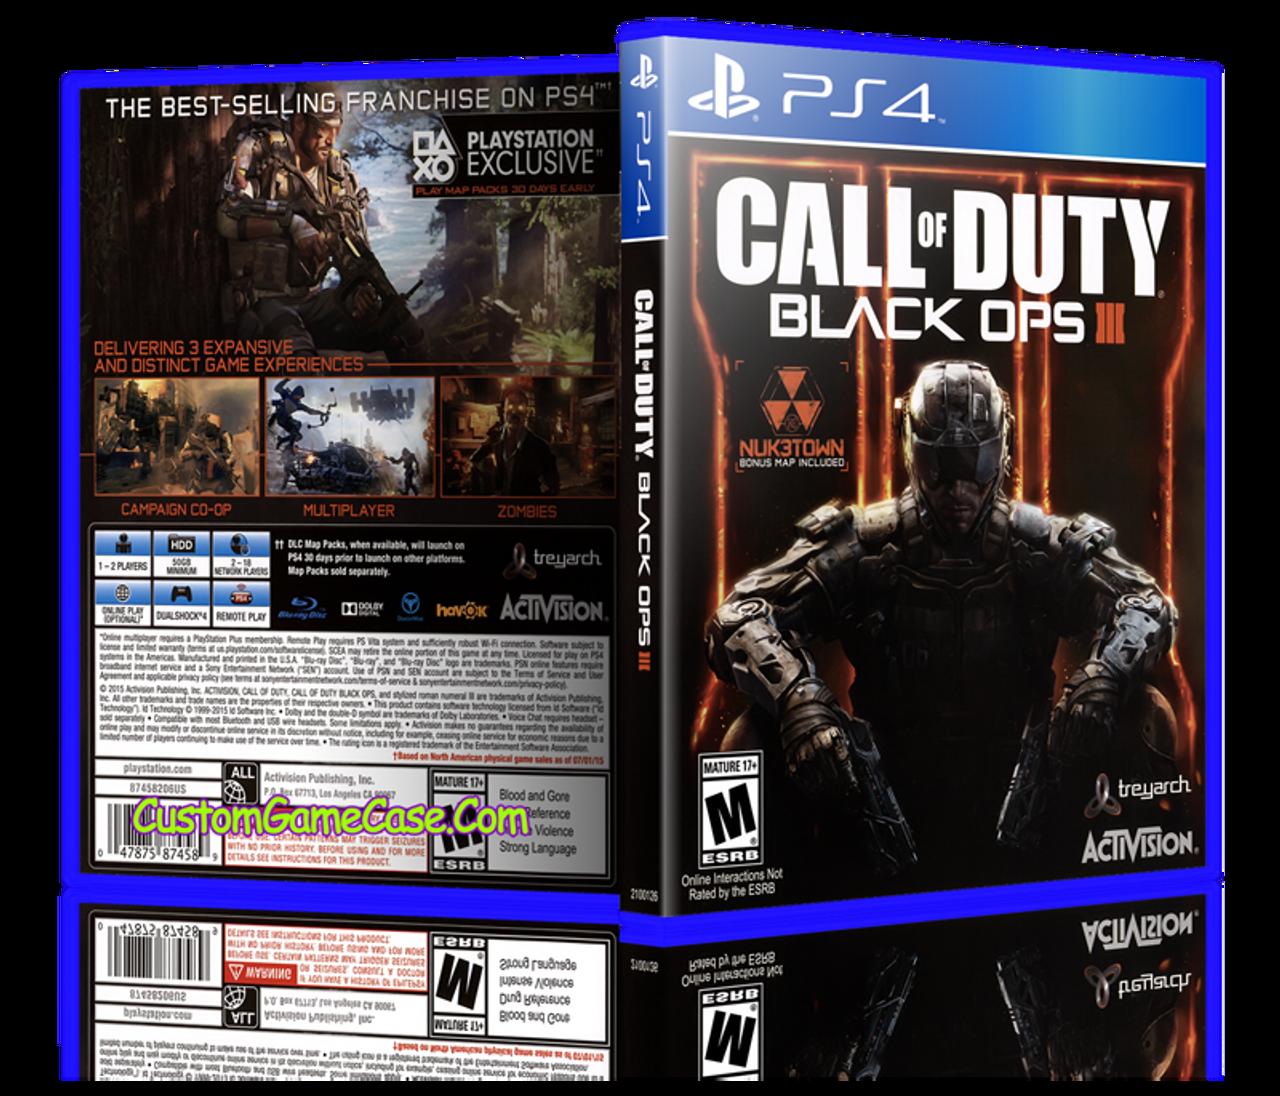 Call Of Duty Black Ops Iii Sony Playstation 4 Ps4 Empty Custom